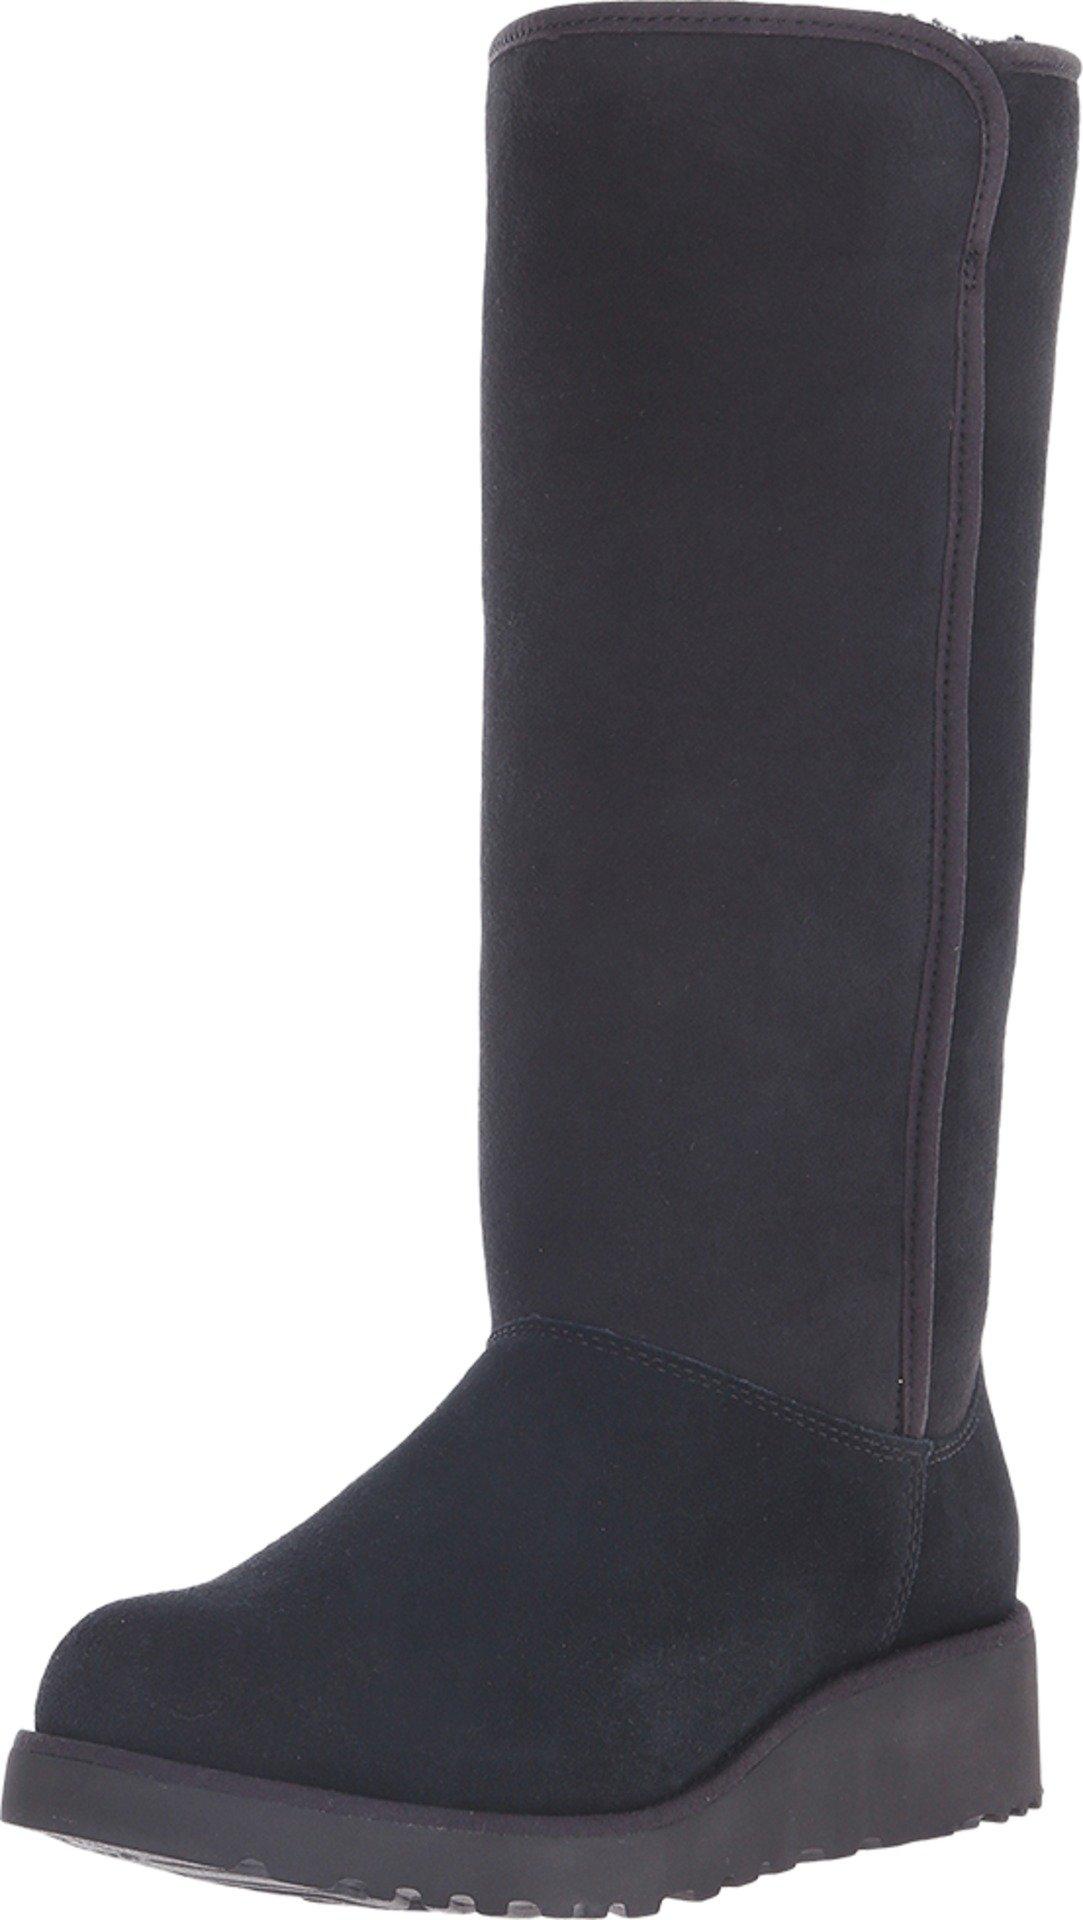 UGG Women's Kara Winter Boot, Black, 12 US/12 B US